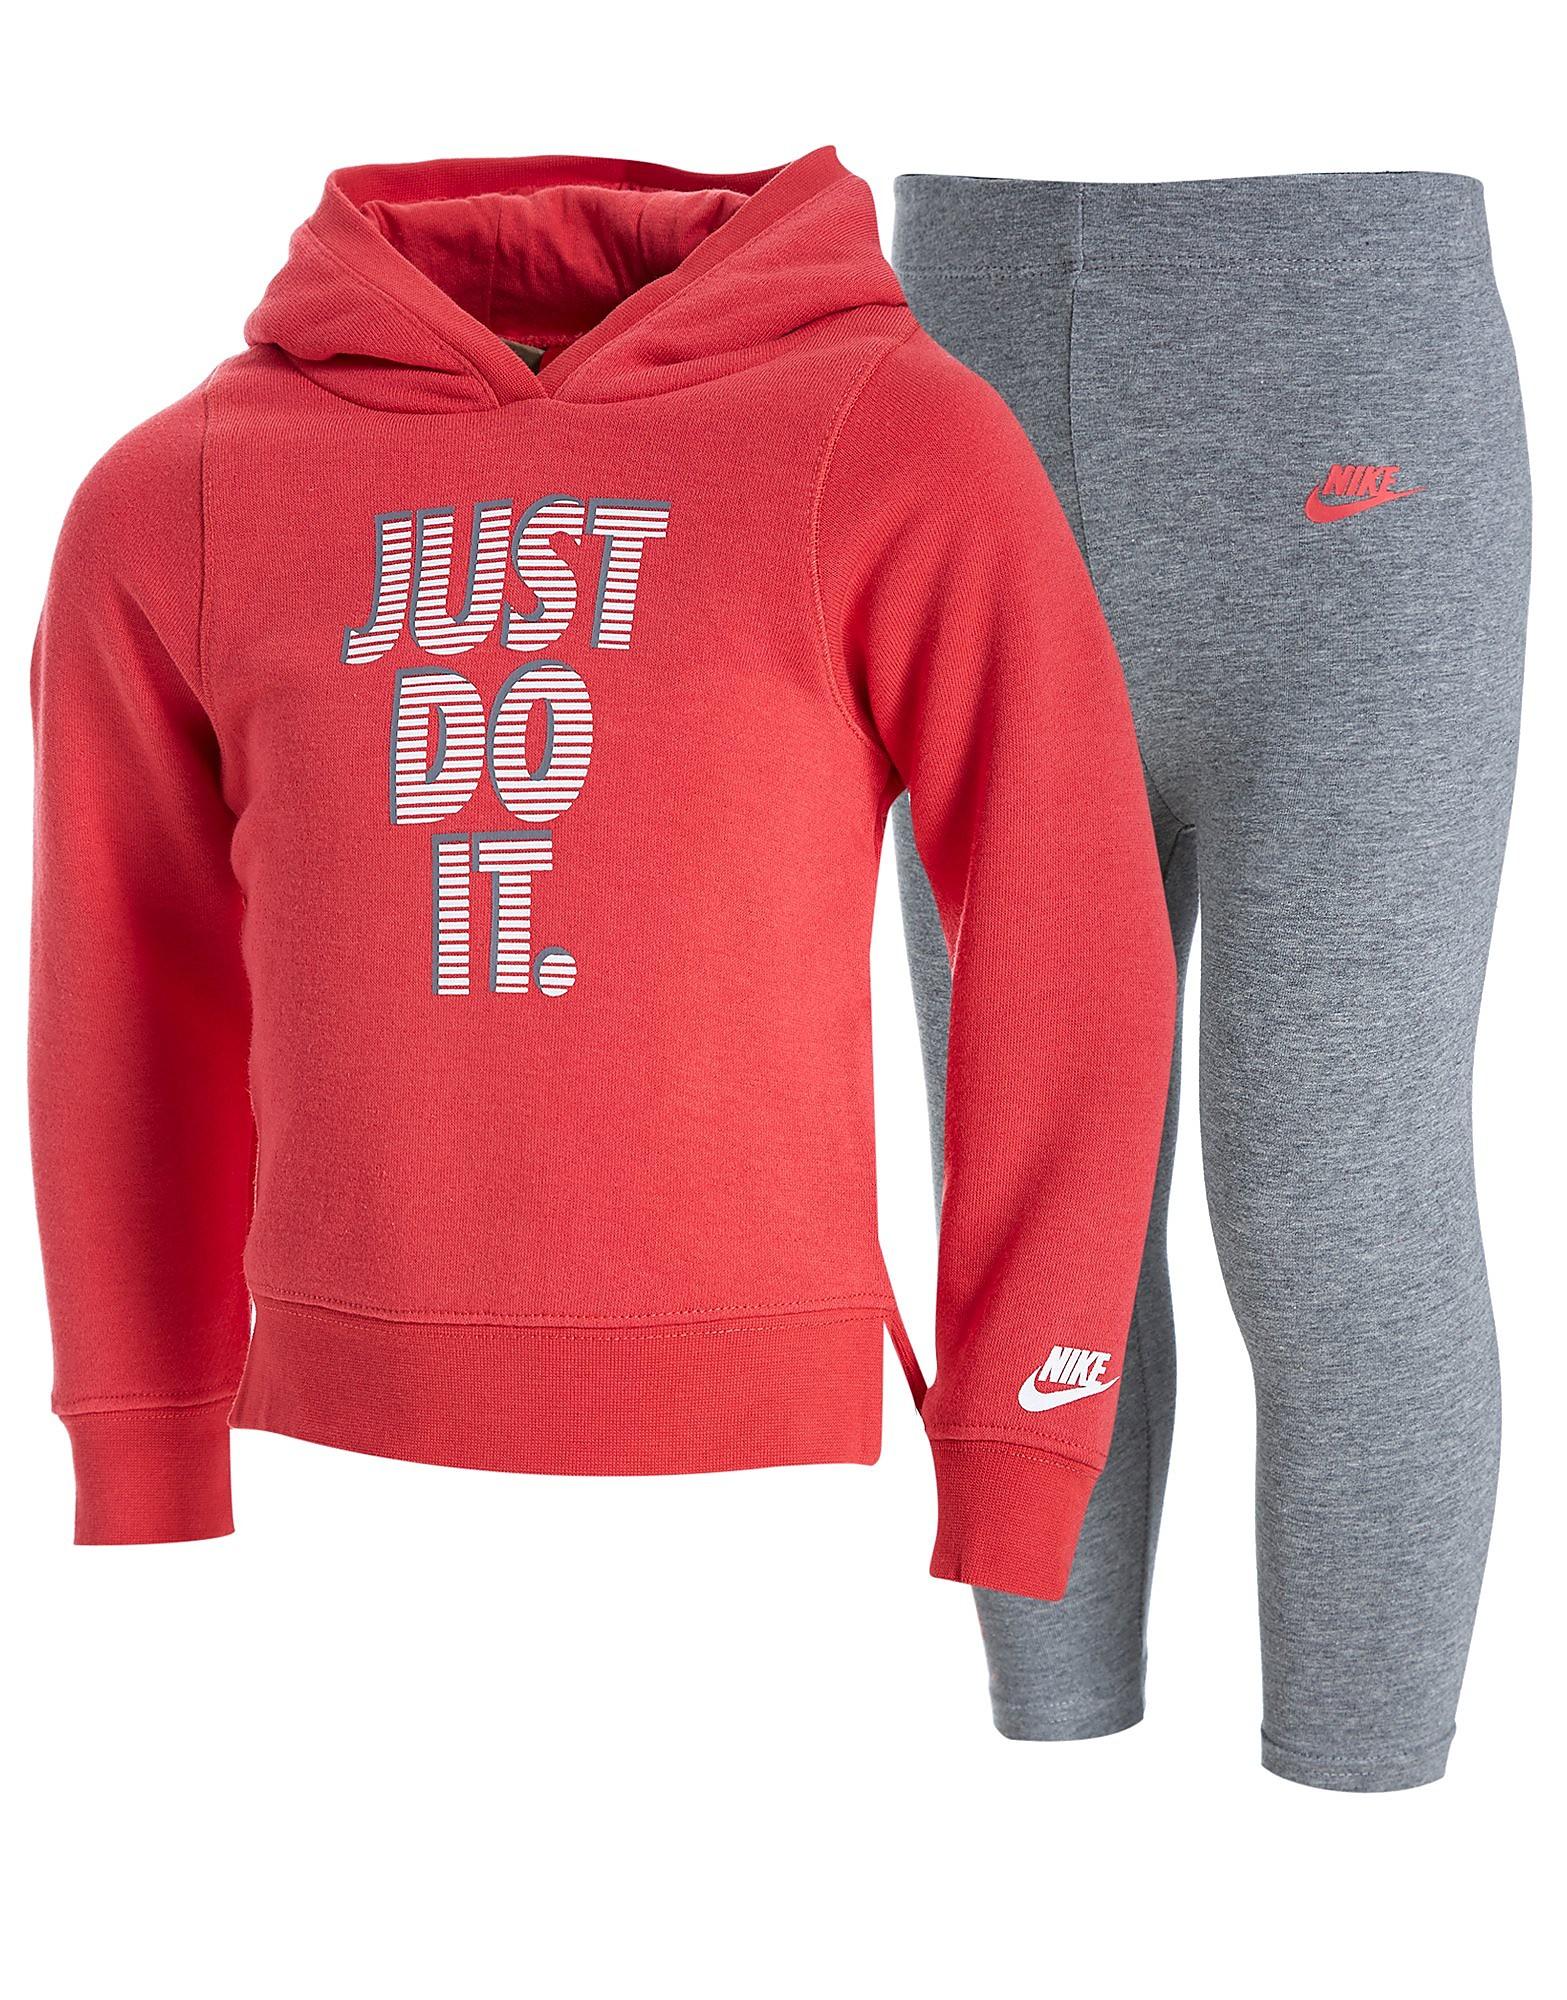 Nike Girls' Just Do It Hoodie/ Leggings Set Infant